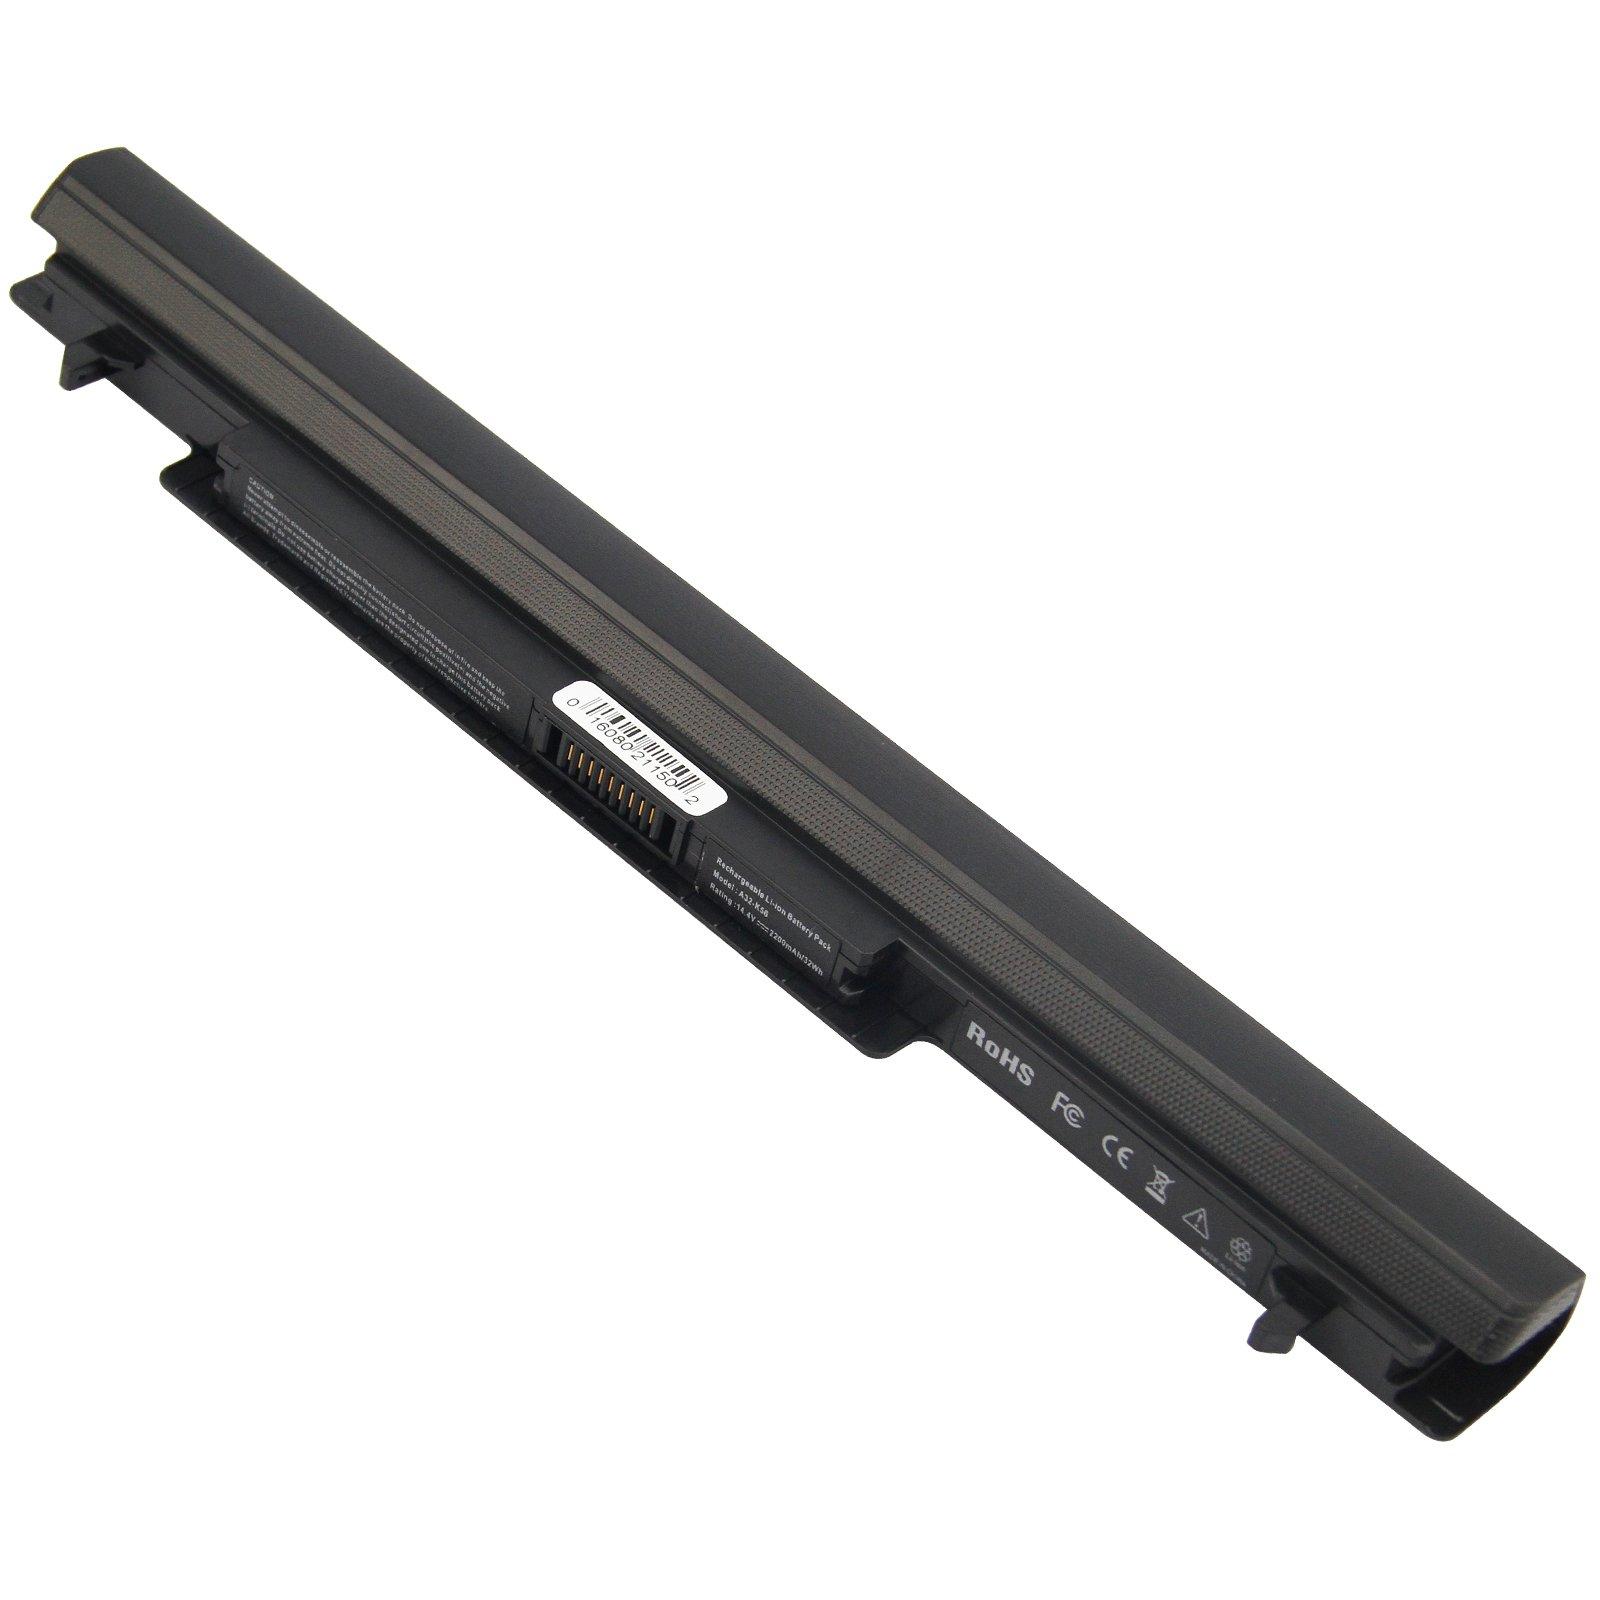 Bateria Para Asus K46cm K46cb K56ca S46c S56ca A31-k56 A32-k56 A41-k56 A42-k56 K56lm2h K56lm9c - Li-ion 6 Celdas 14.8v 2